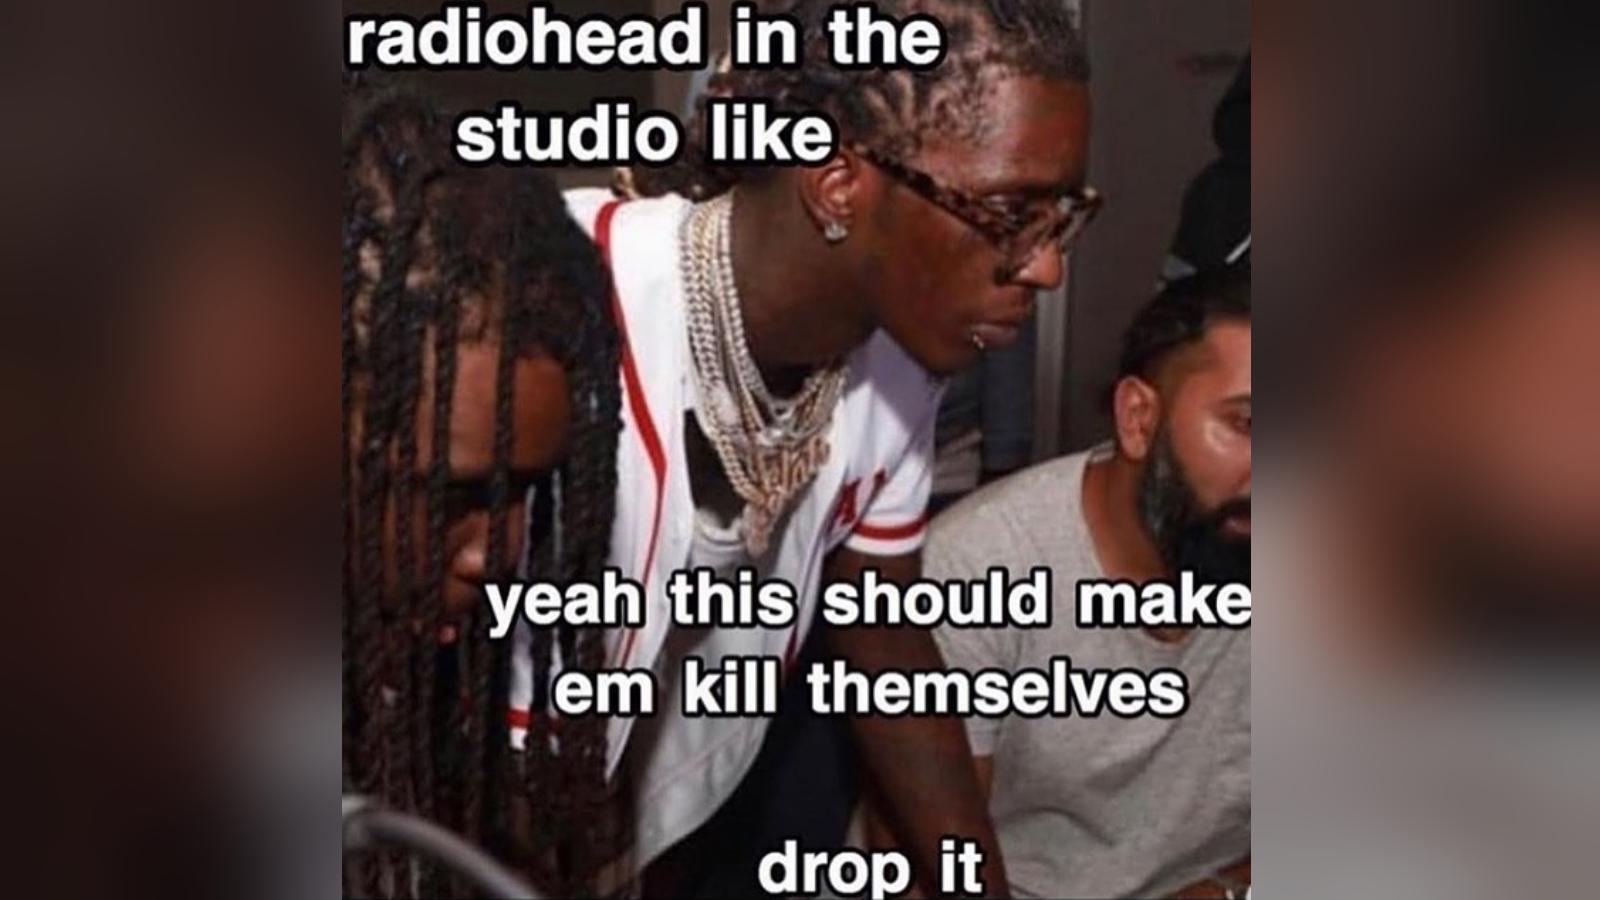 In the Studio Like,